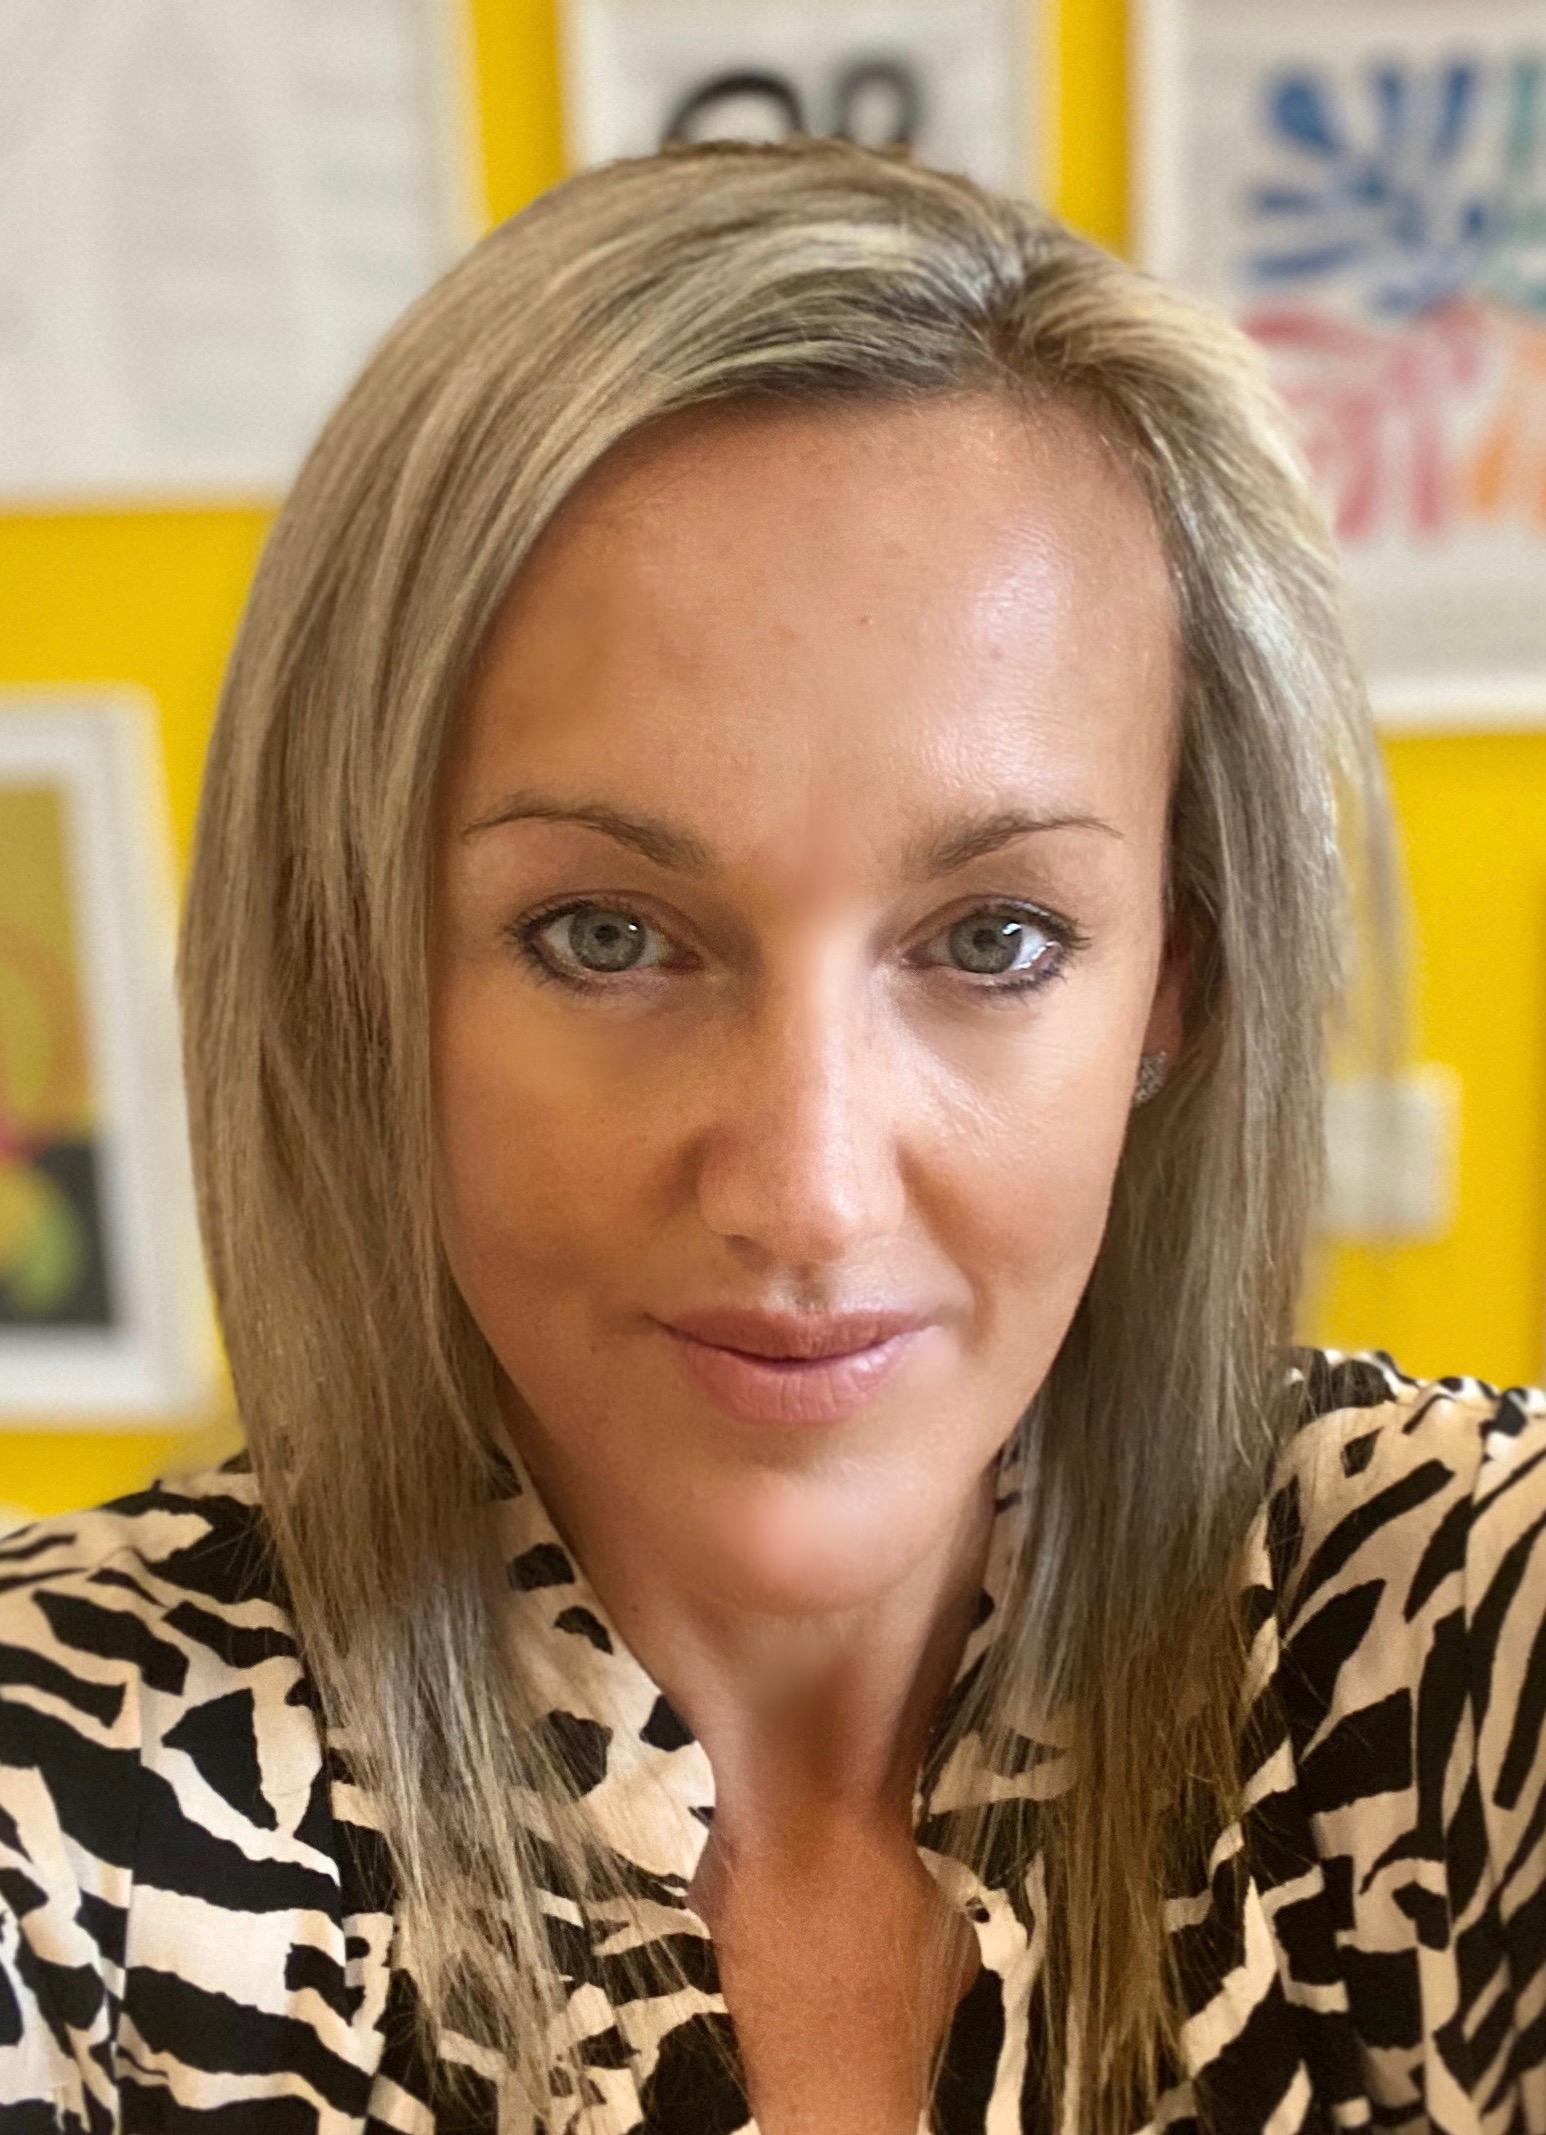 Rachael Hufton